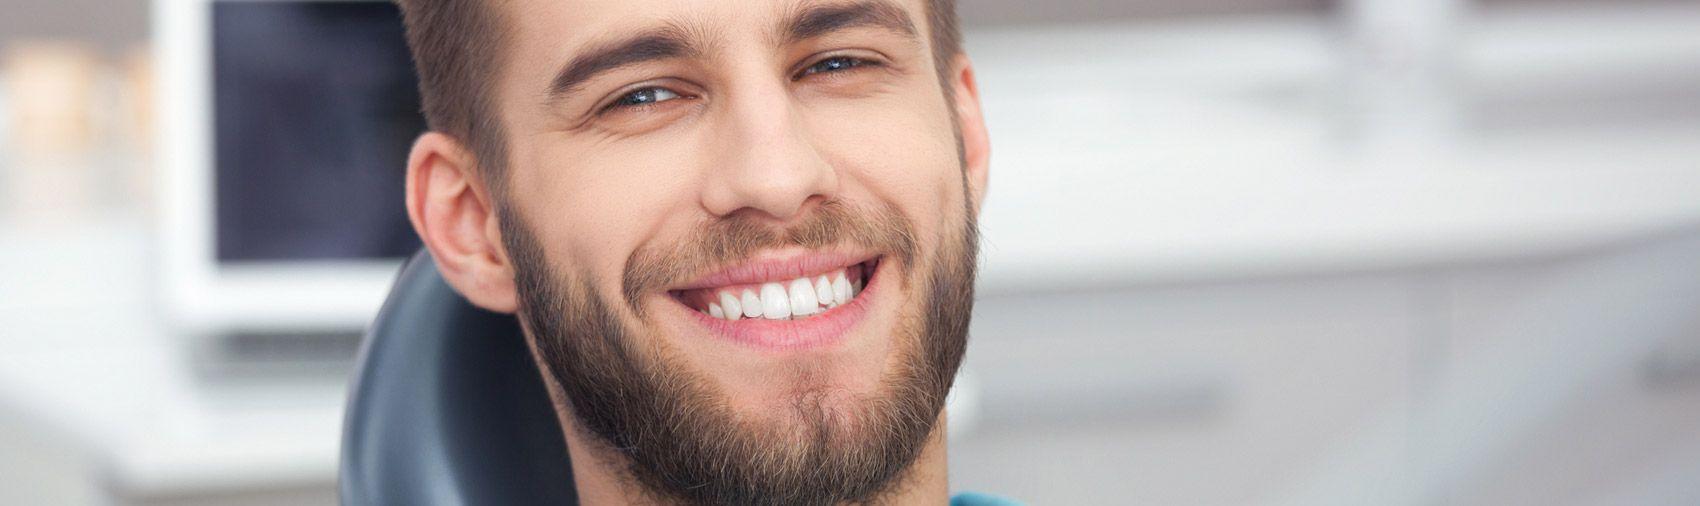 Oral Cancer Exam - Meredith Levine, DDS, Inc.